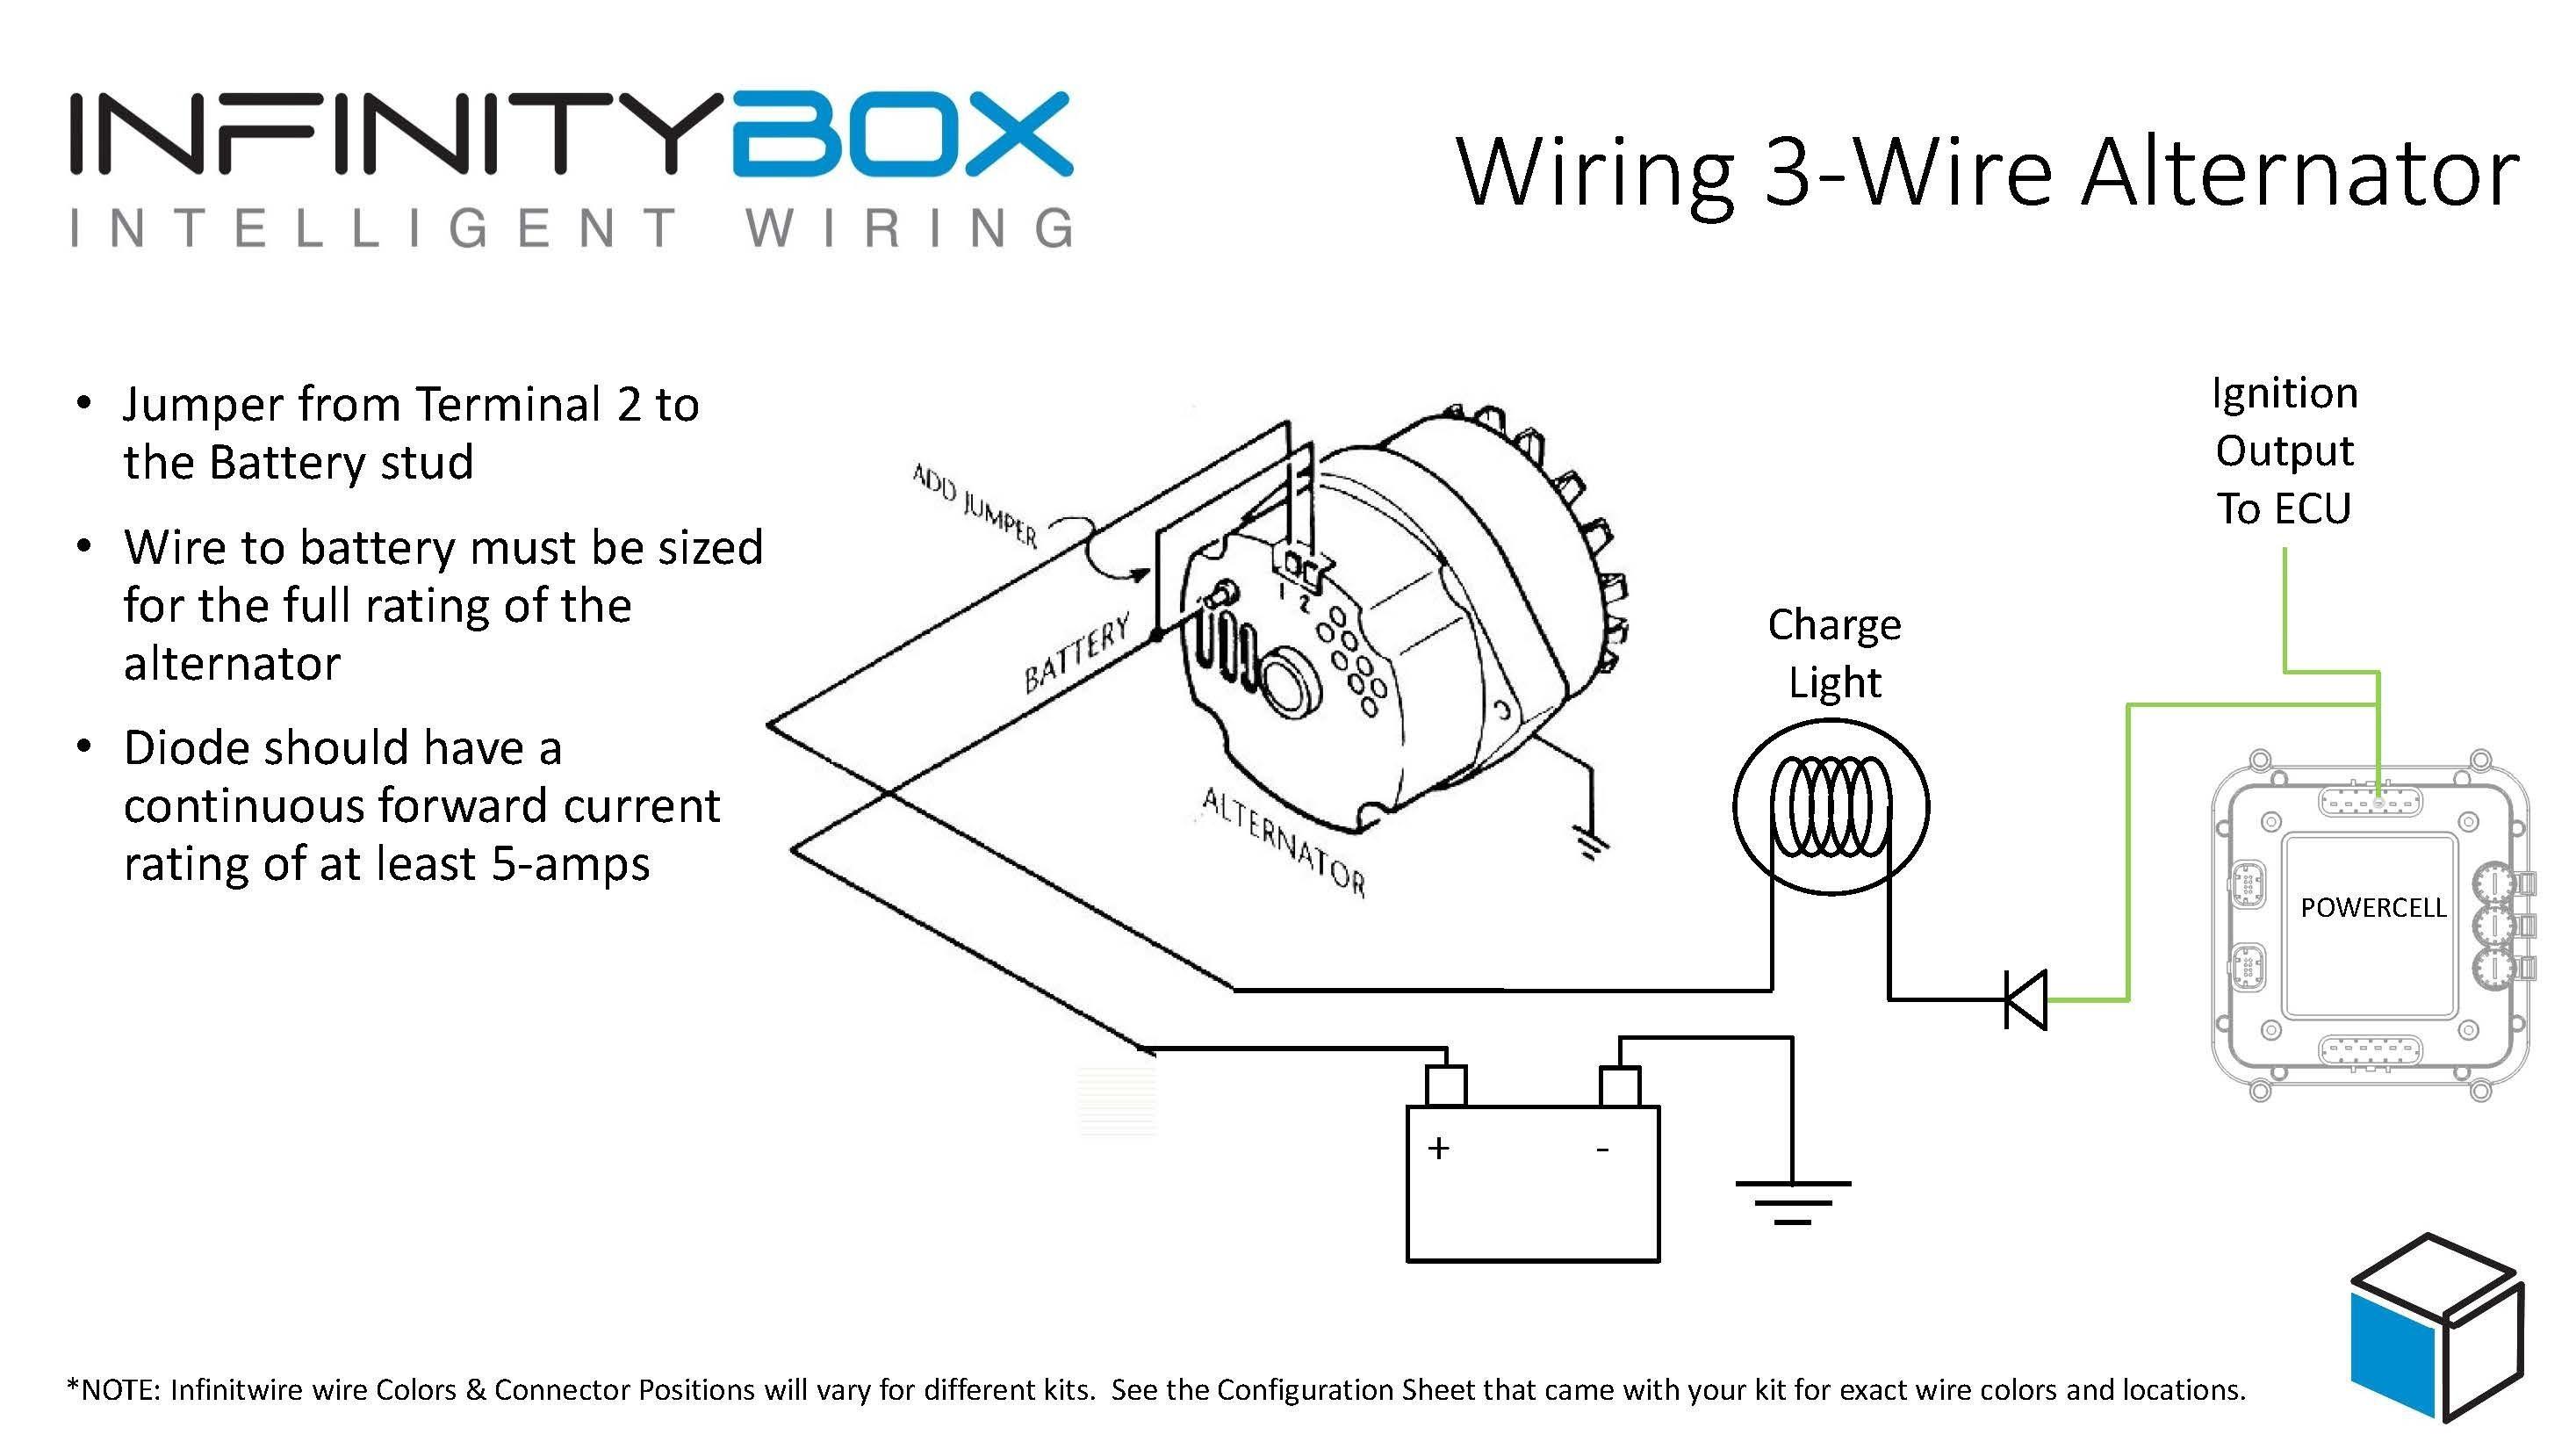 mercruiser 260 alternator wiring diagram 2007 nissan xterra radio to battery new